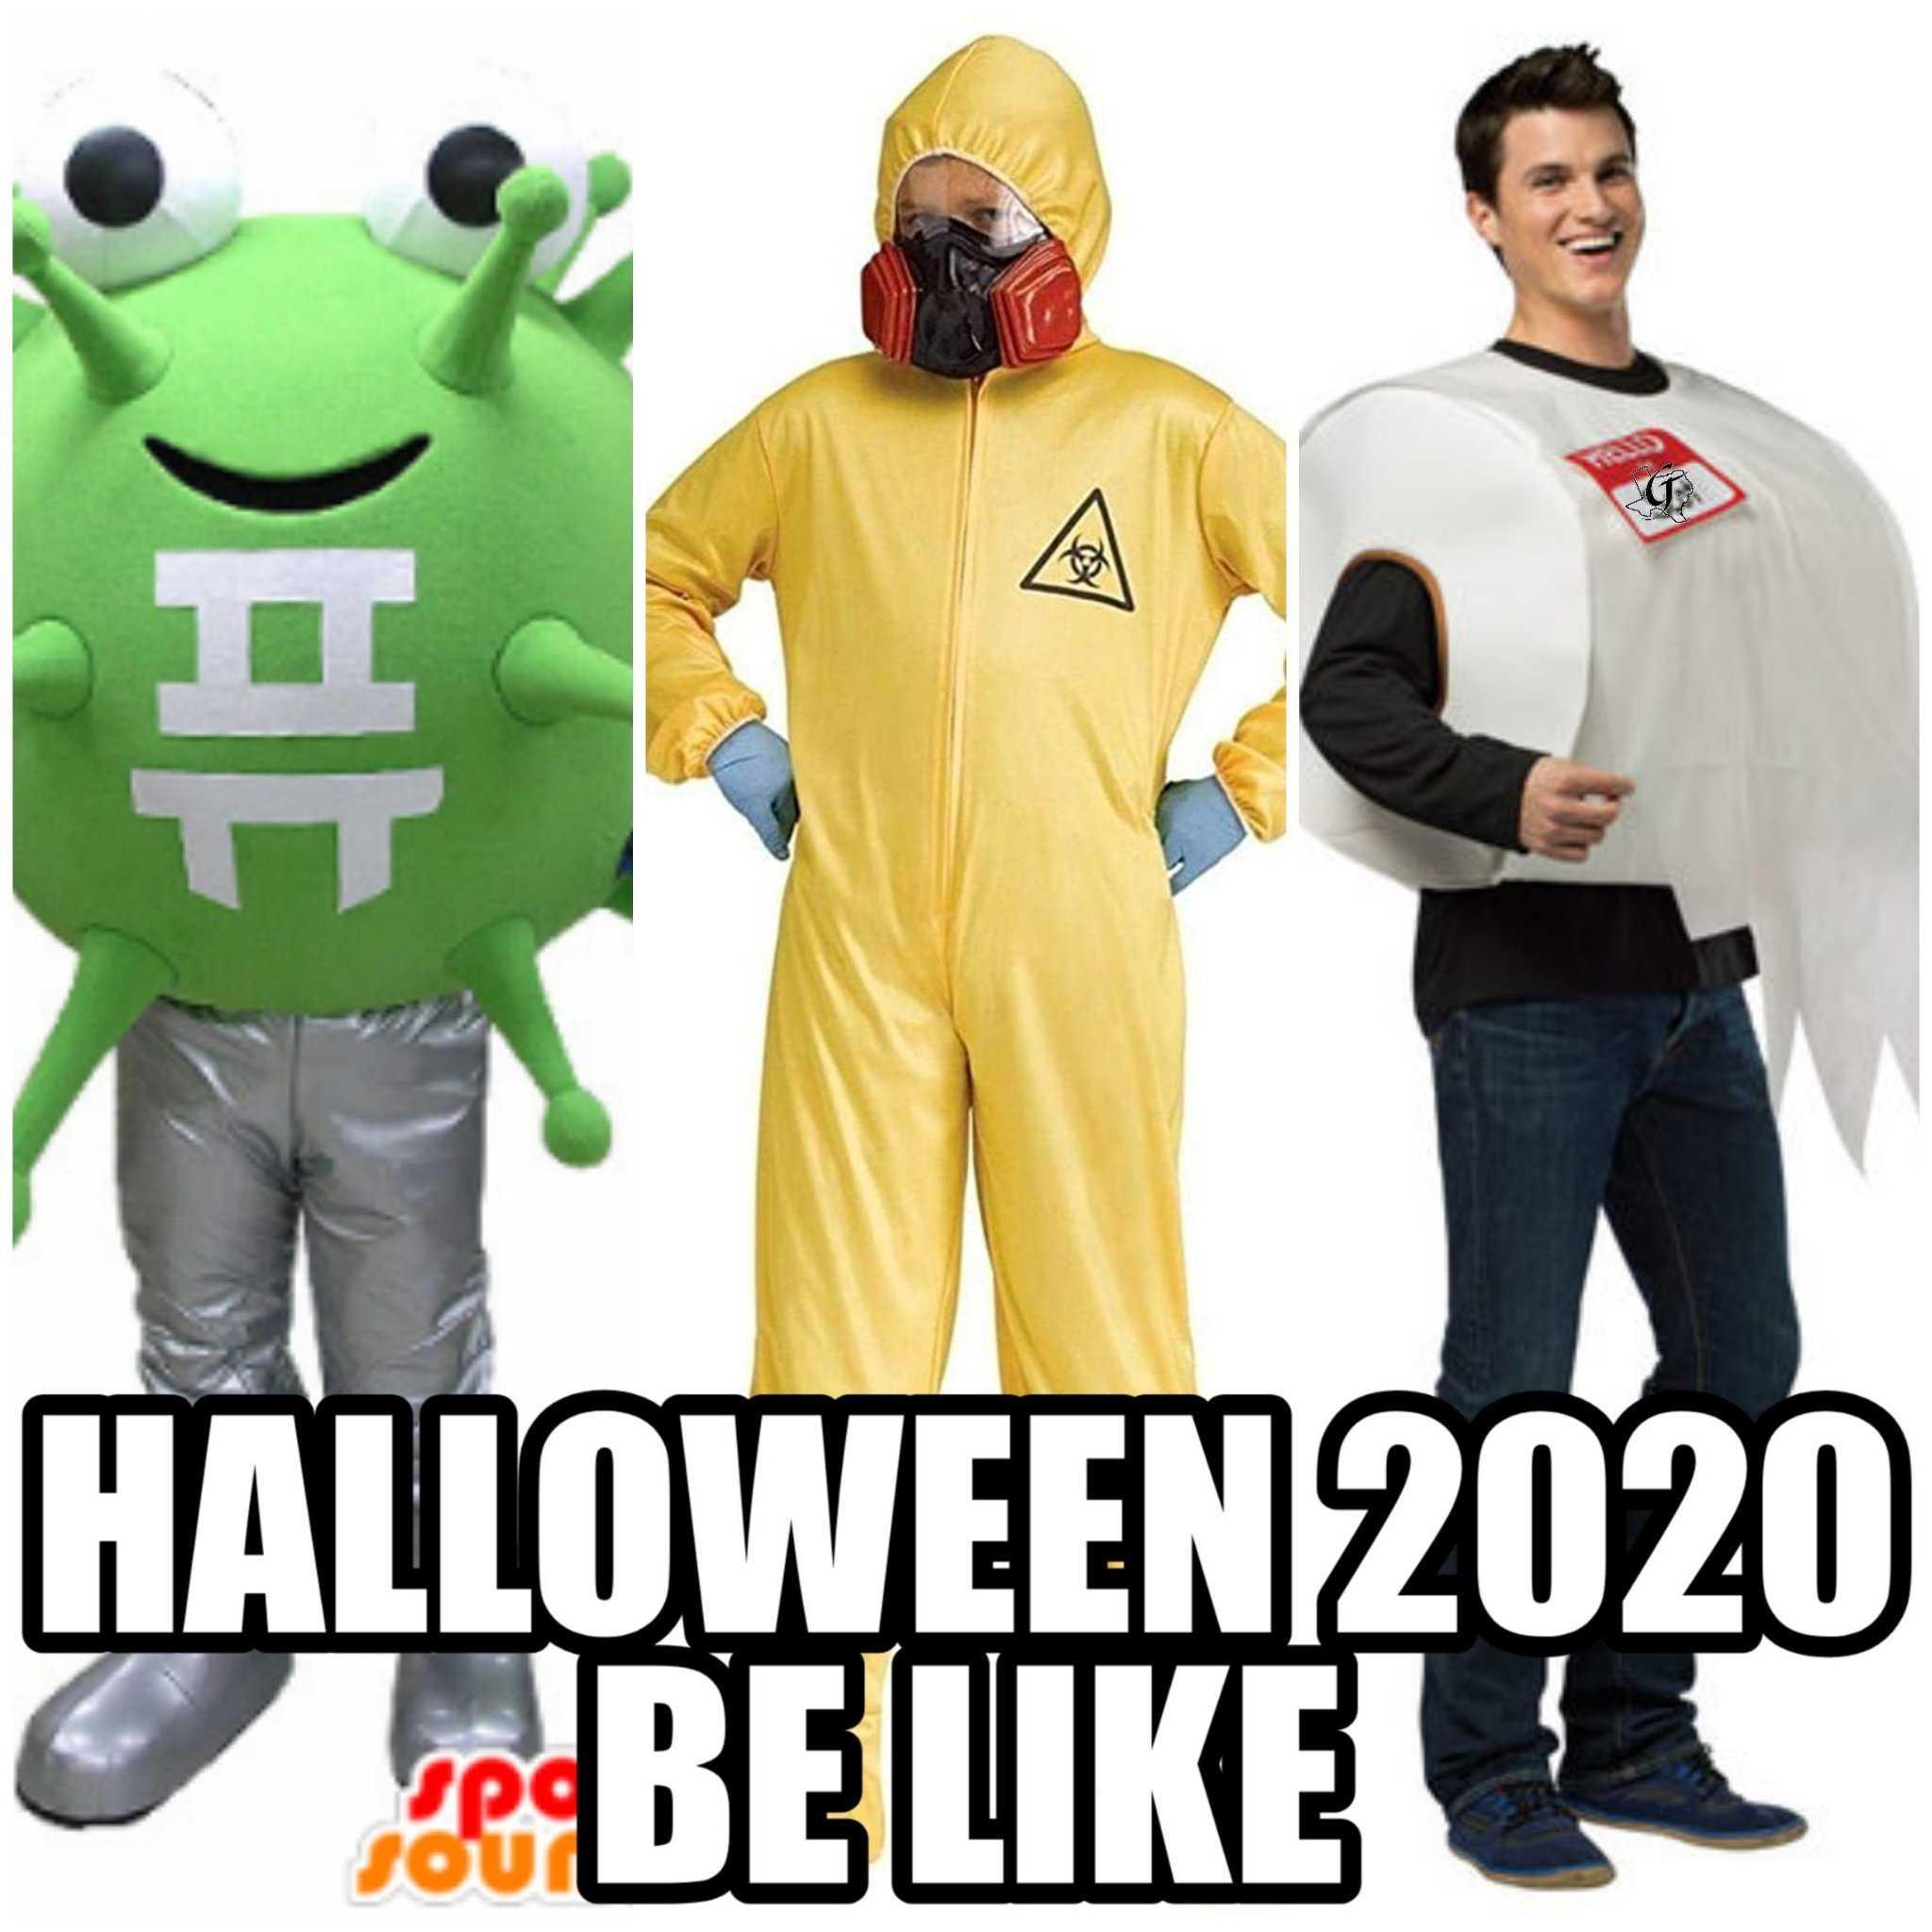 halloween memes 2 - costumes